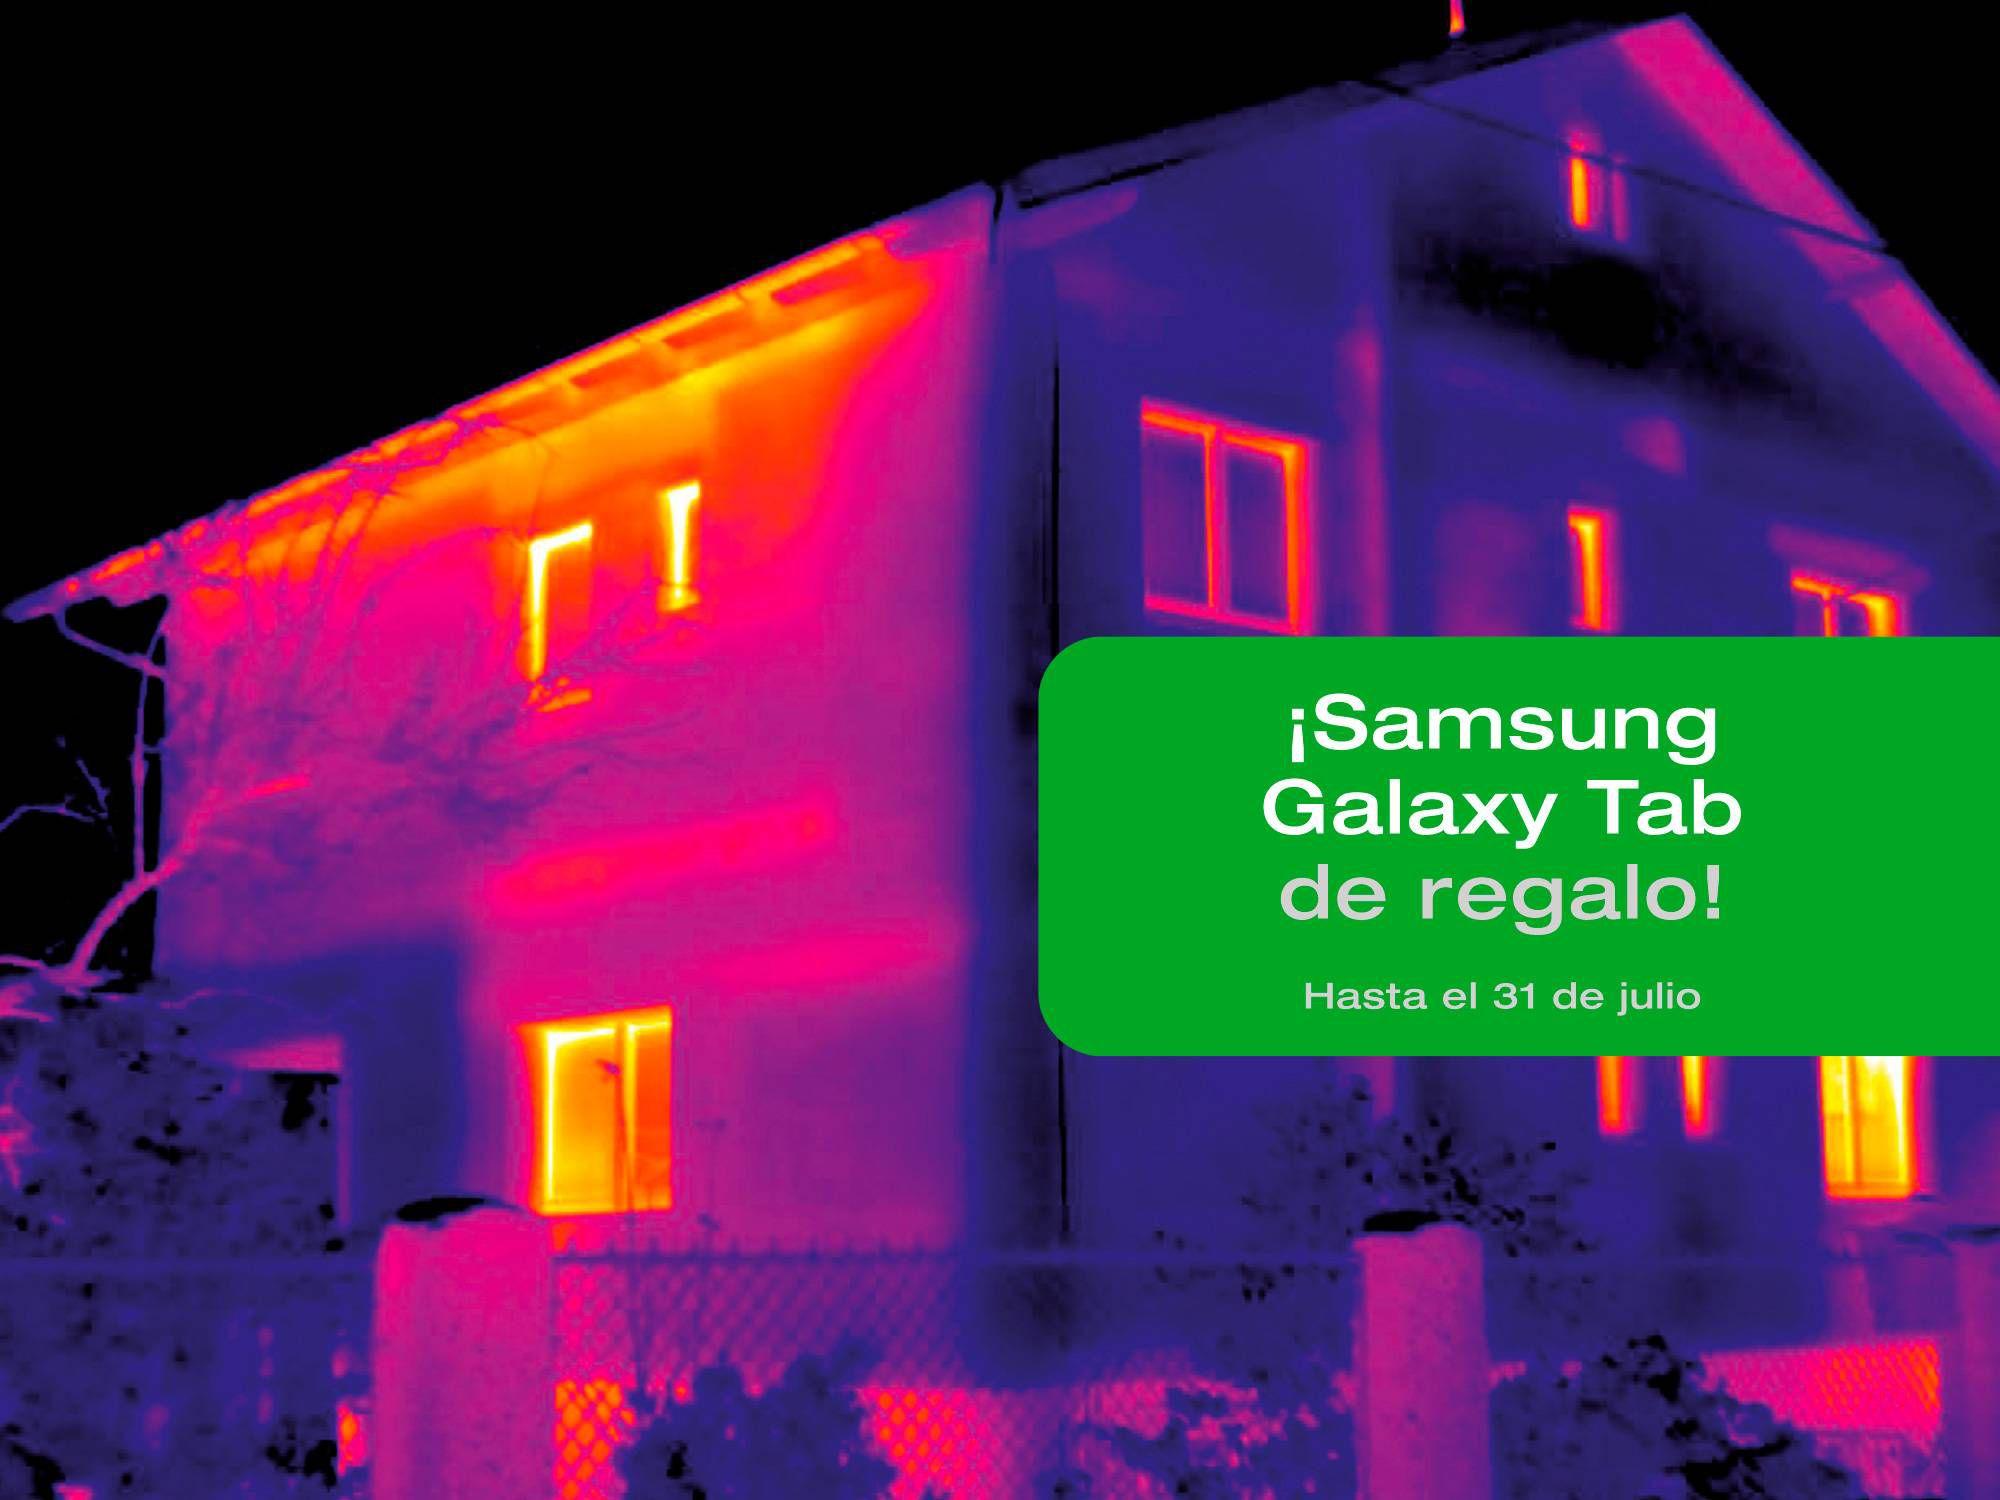 Termografía testo de un edificio